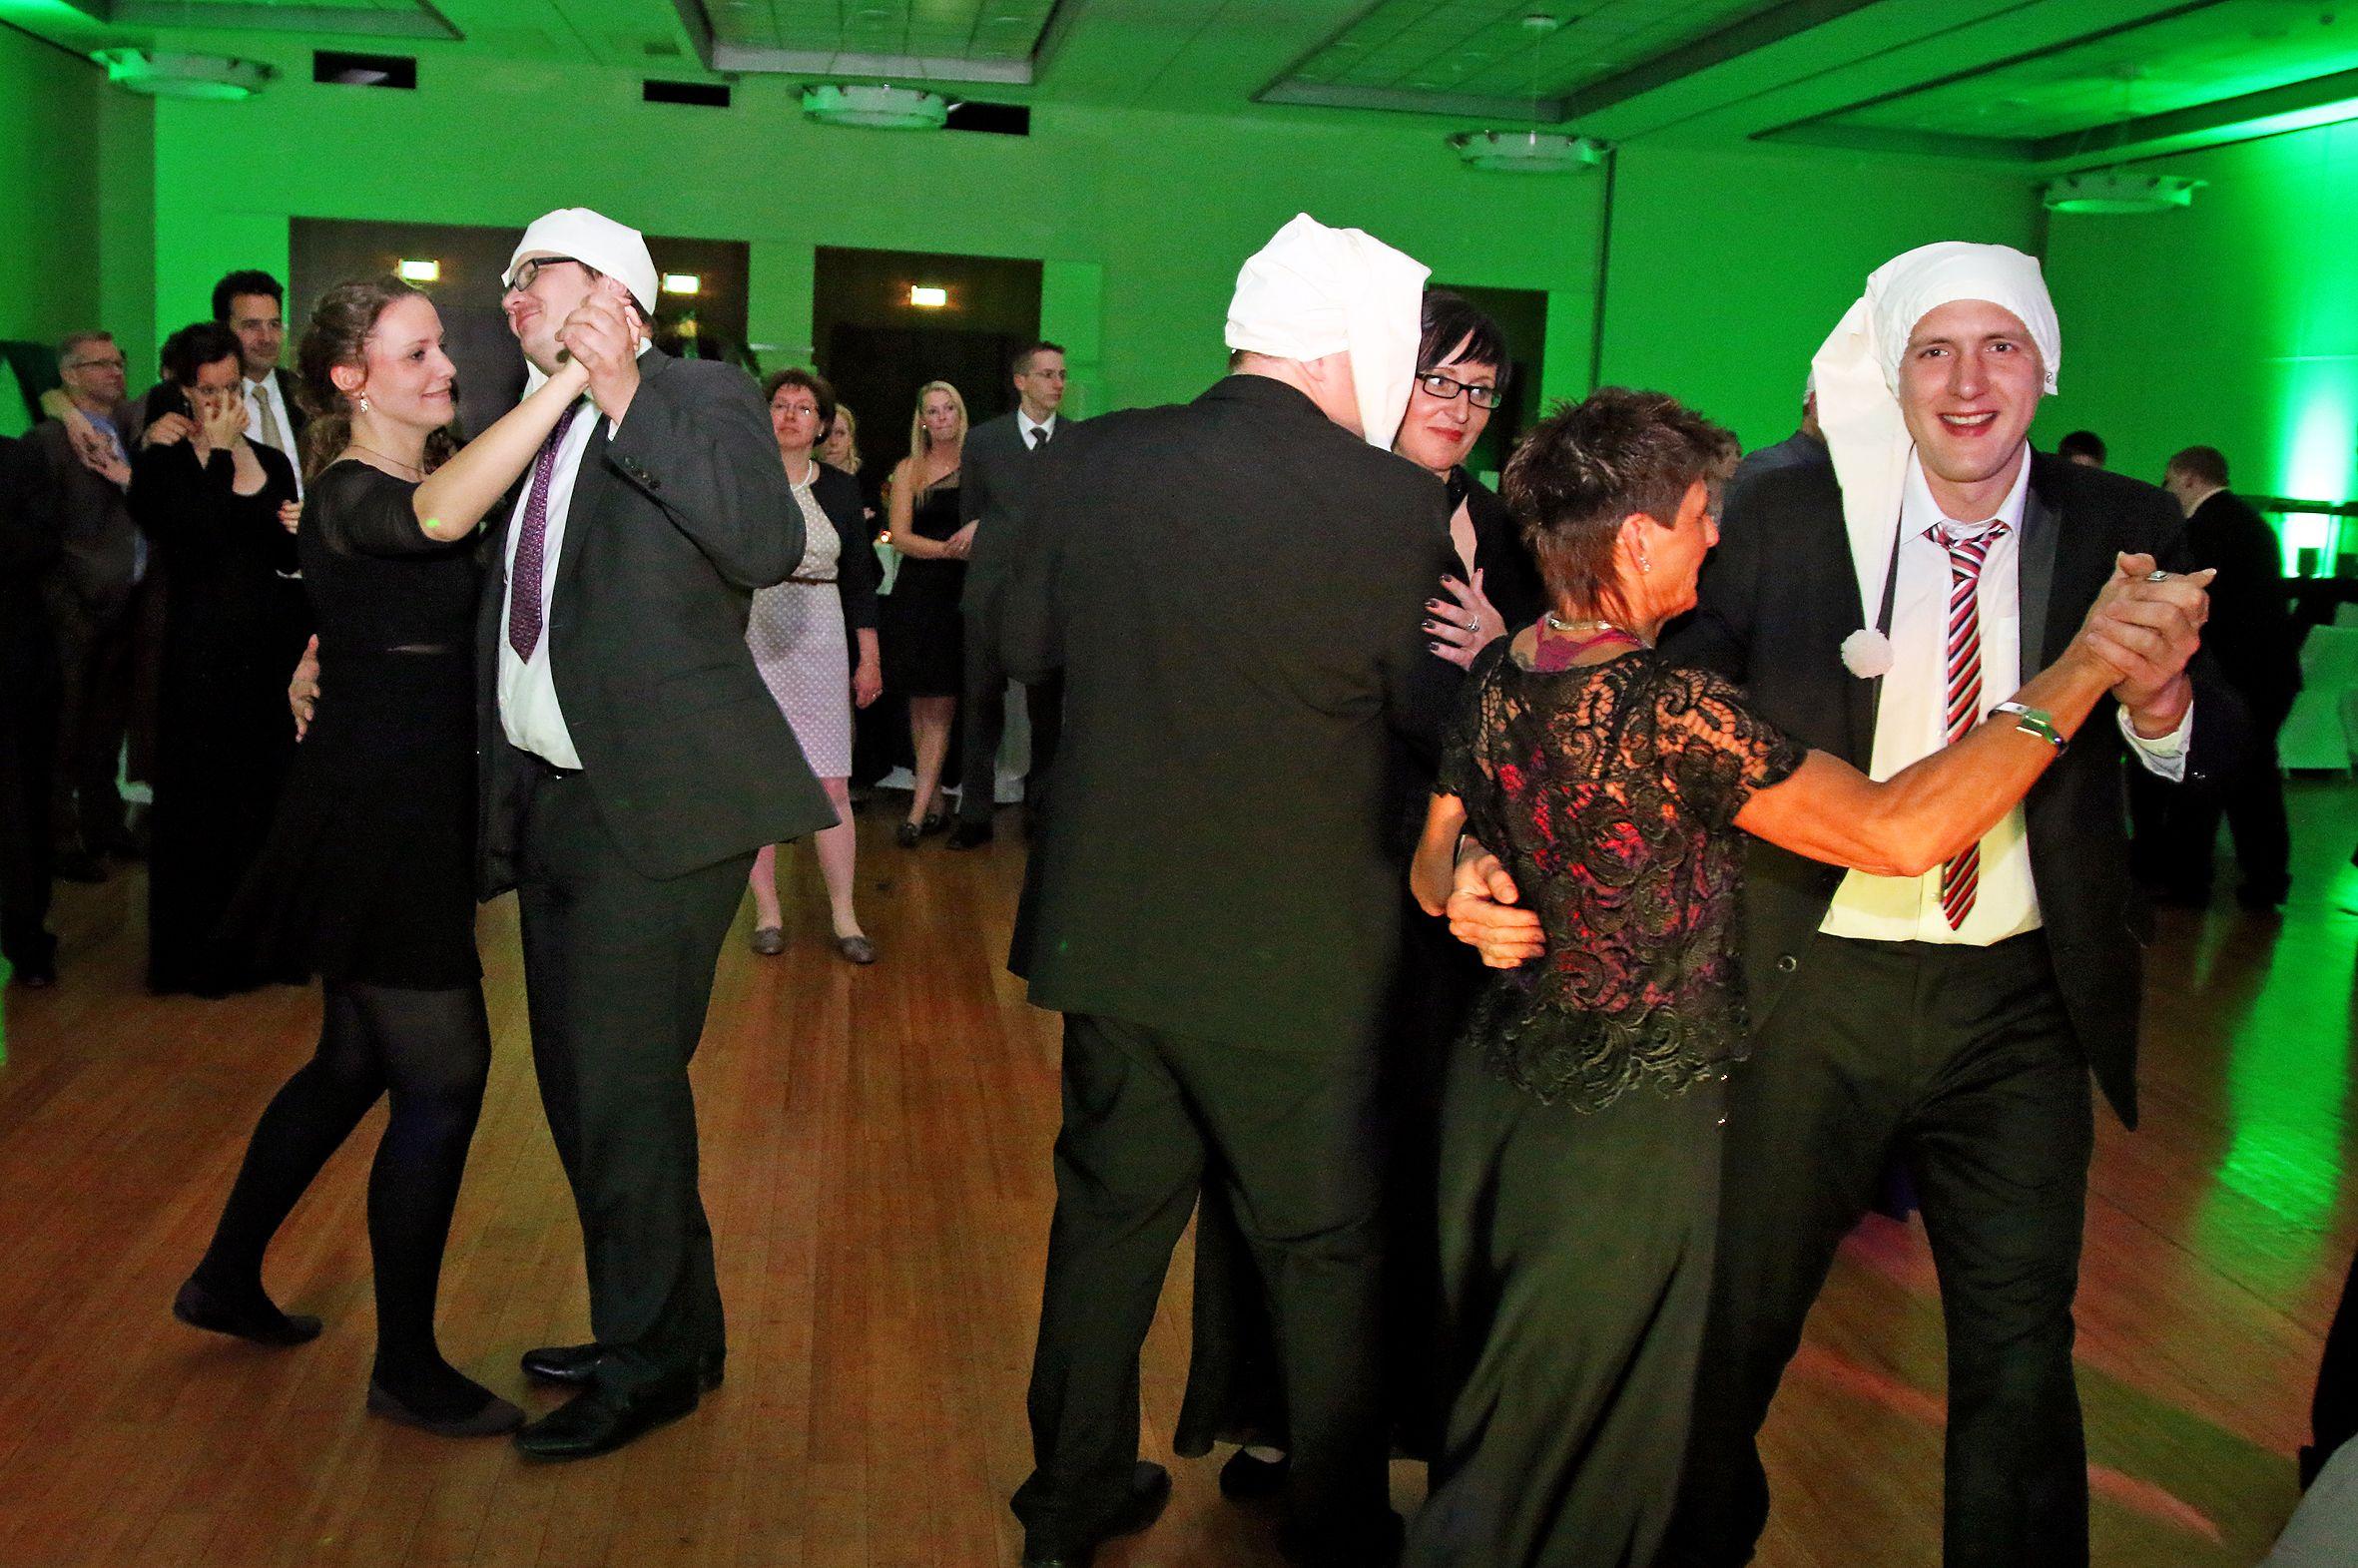 Silvester single party niedersachsen